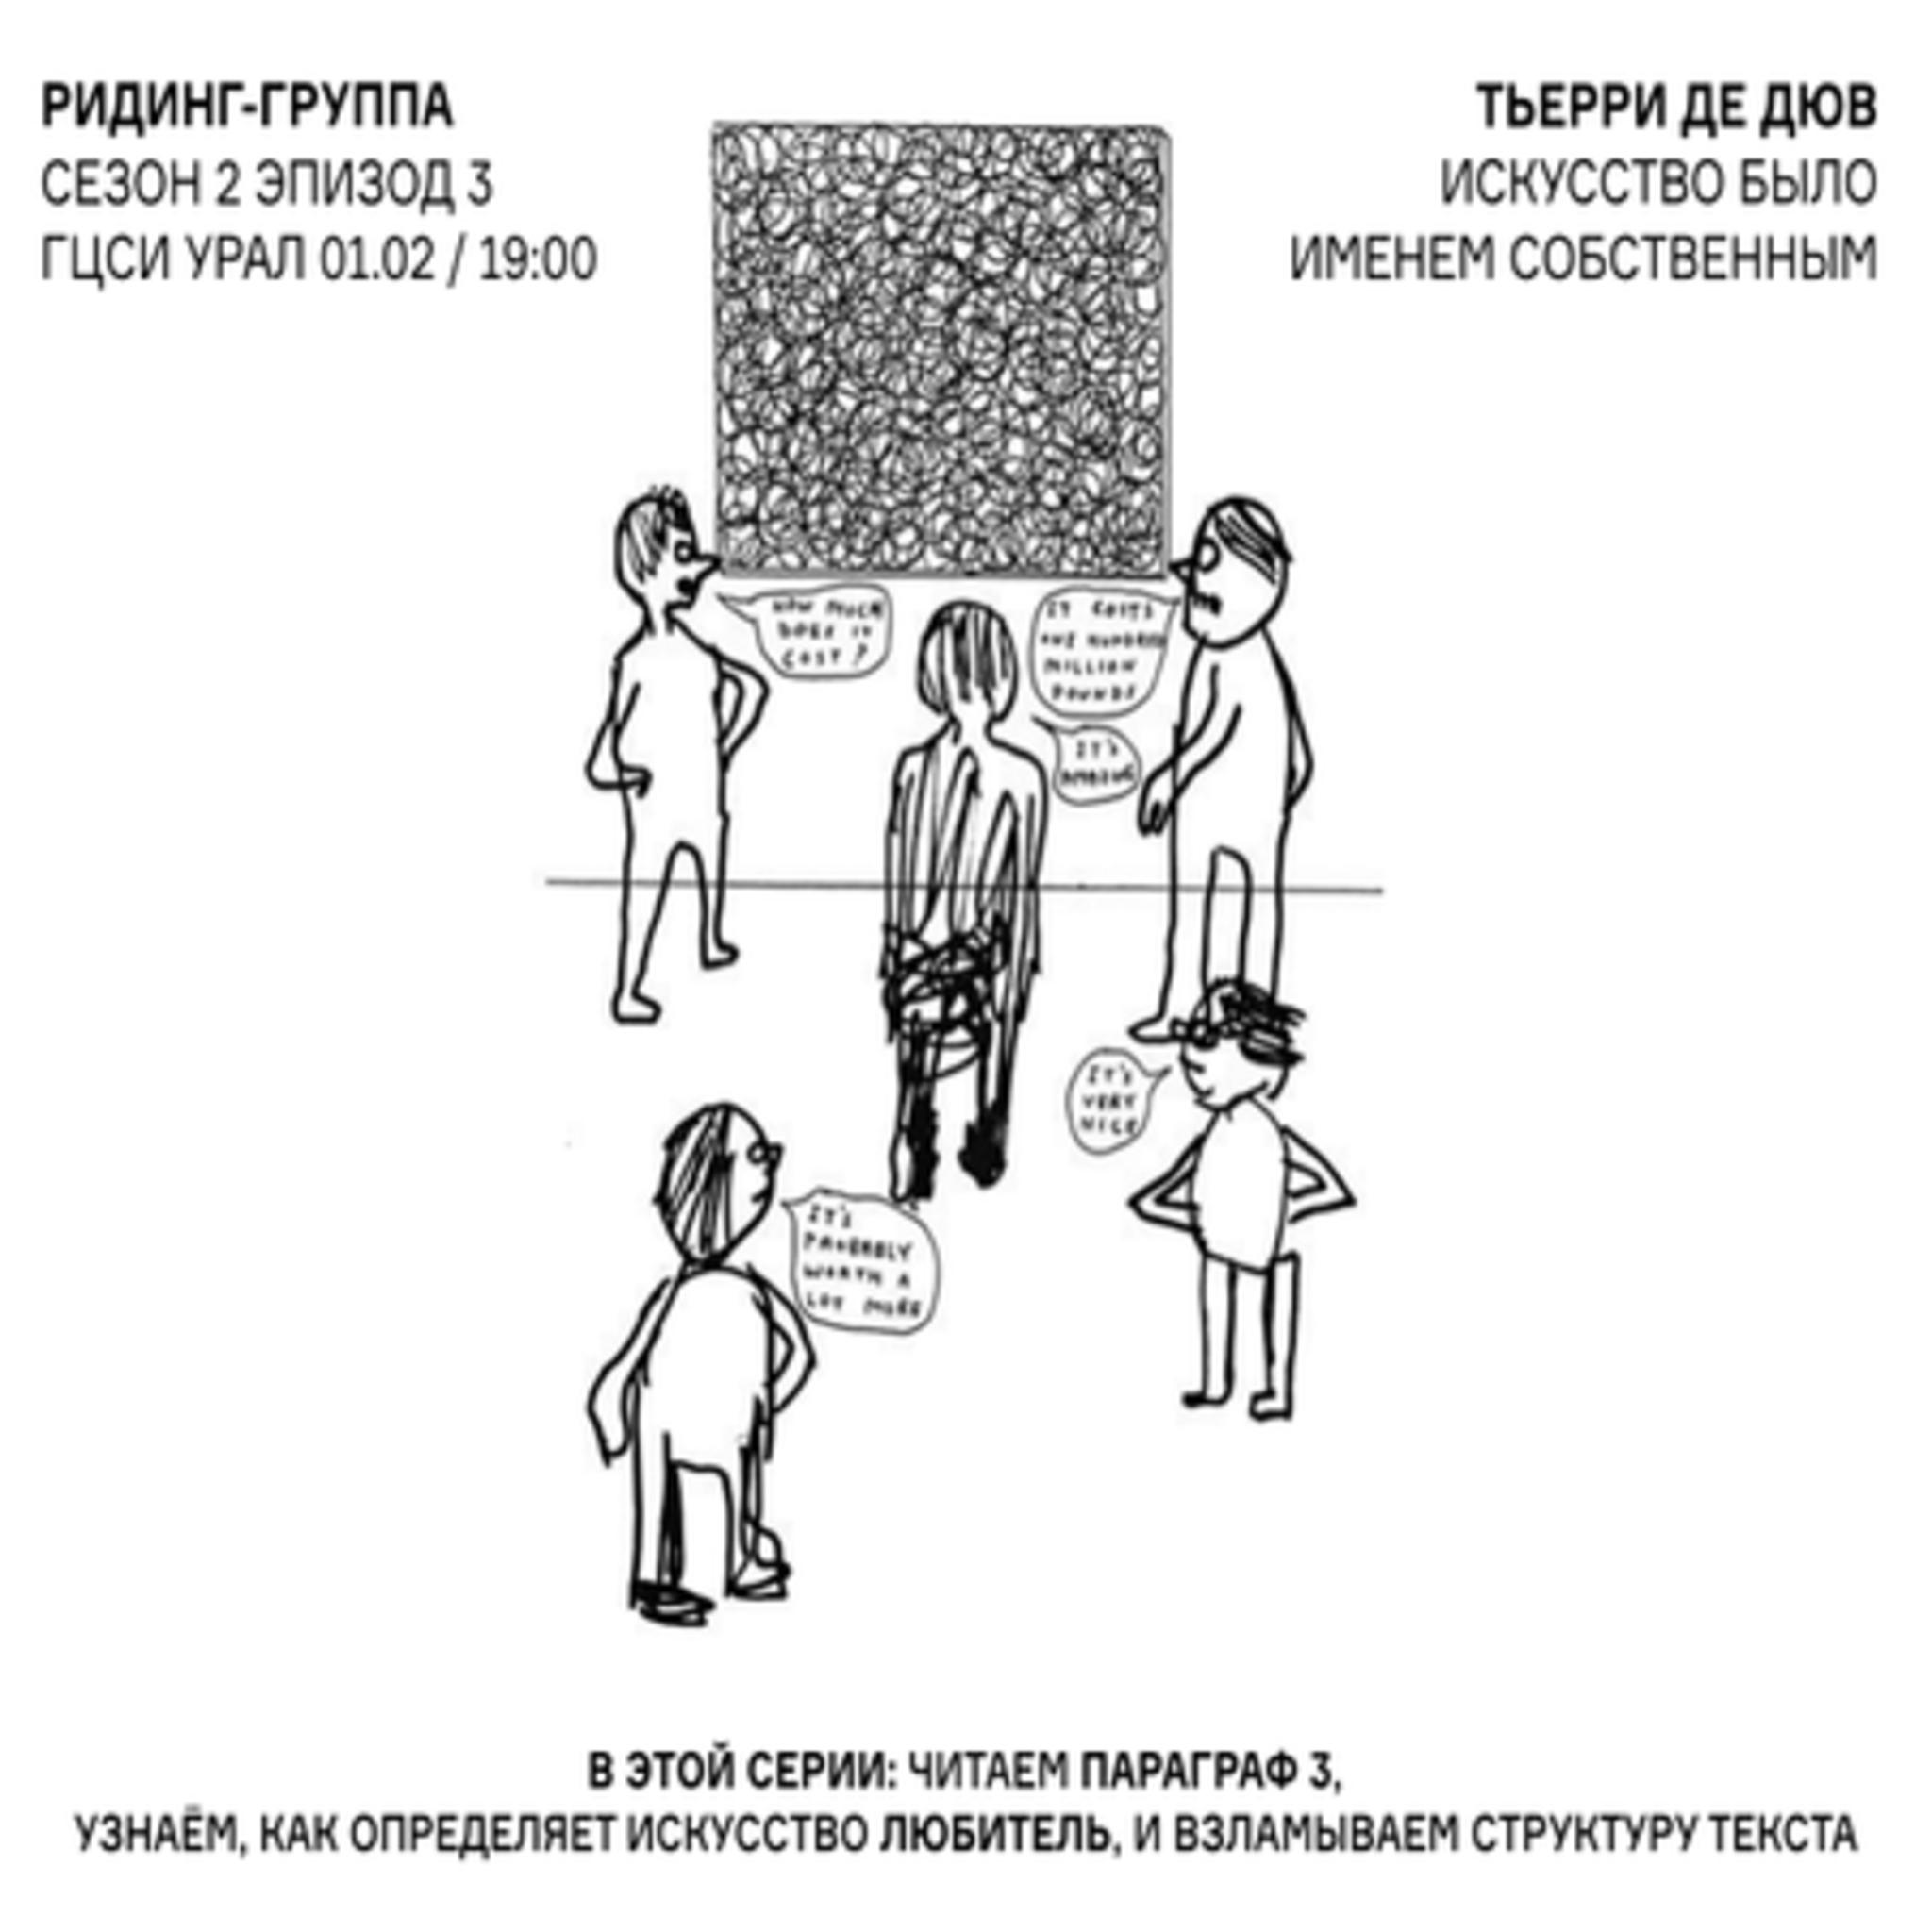 Ридинг-группа ГЦСИ Урал: сезон 2 серия 3